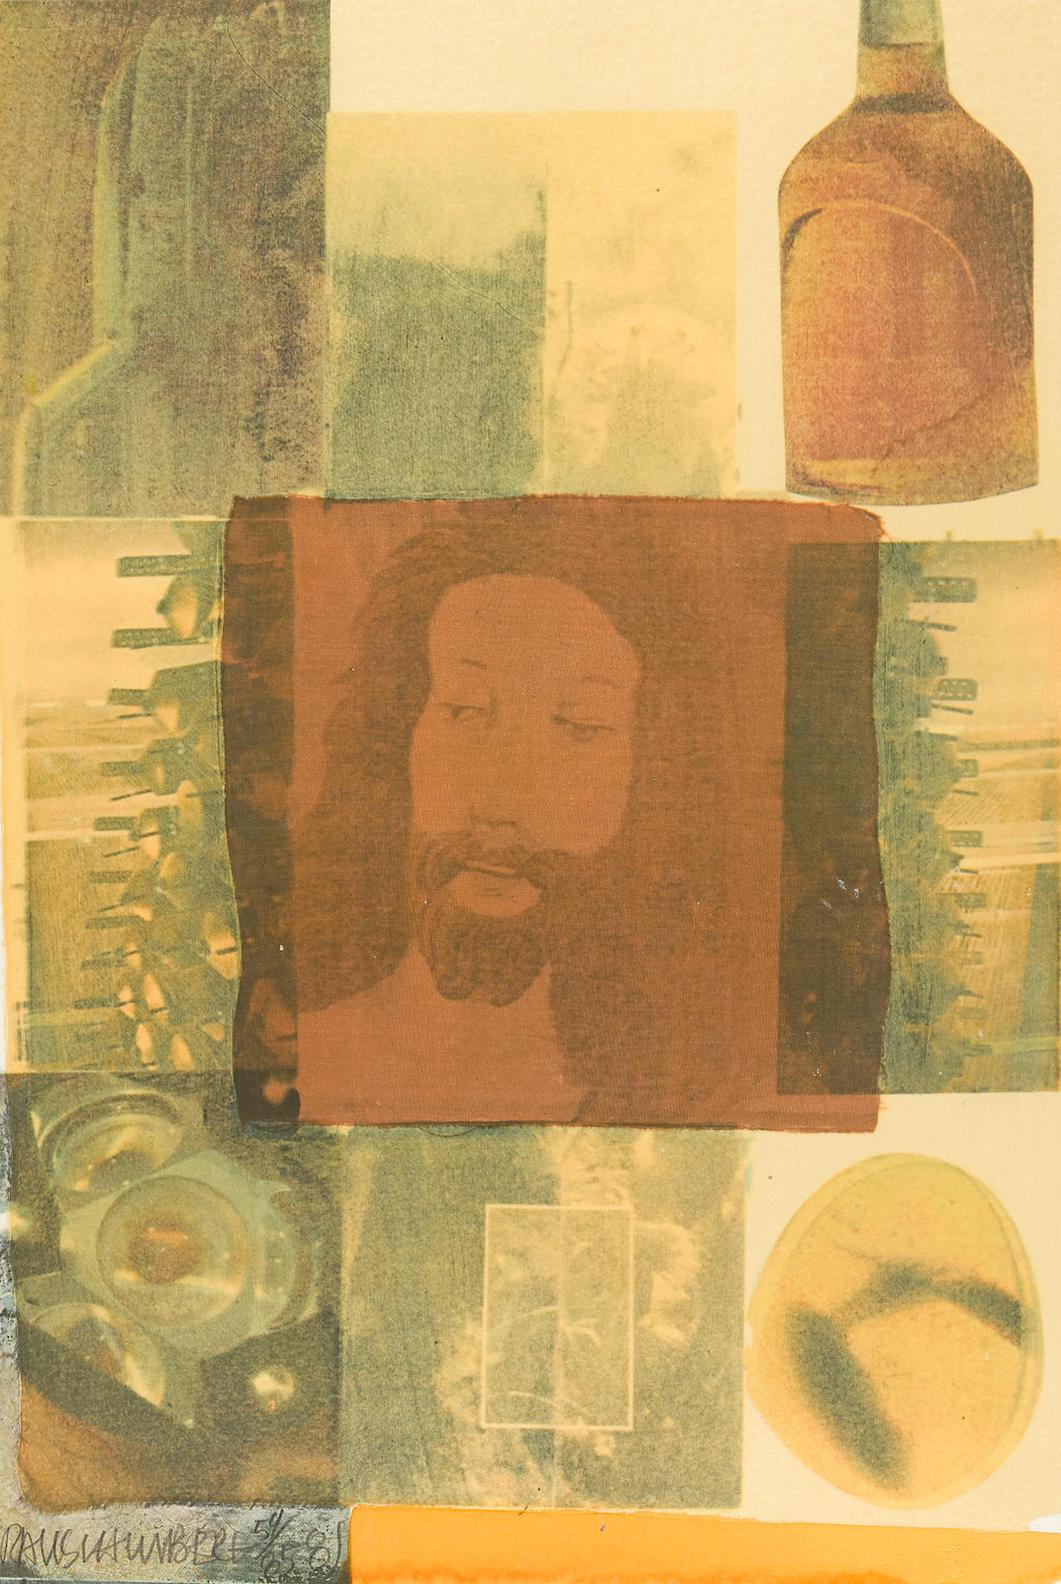 Robert Rauschenberg-Arcanum Vi, From Arcanum Series-1981